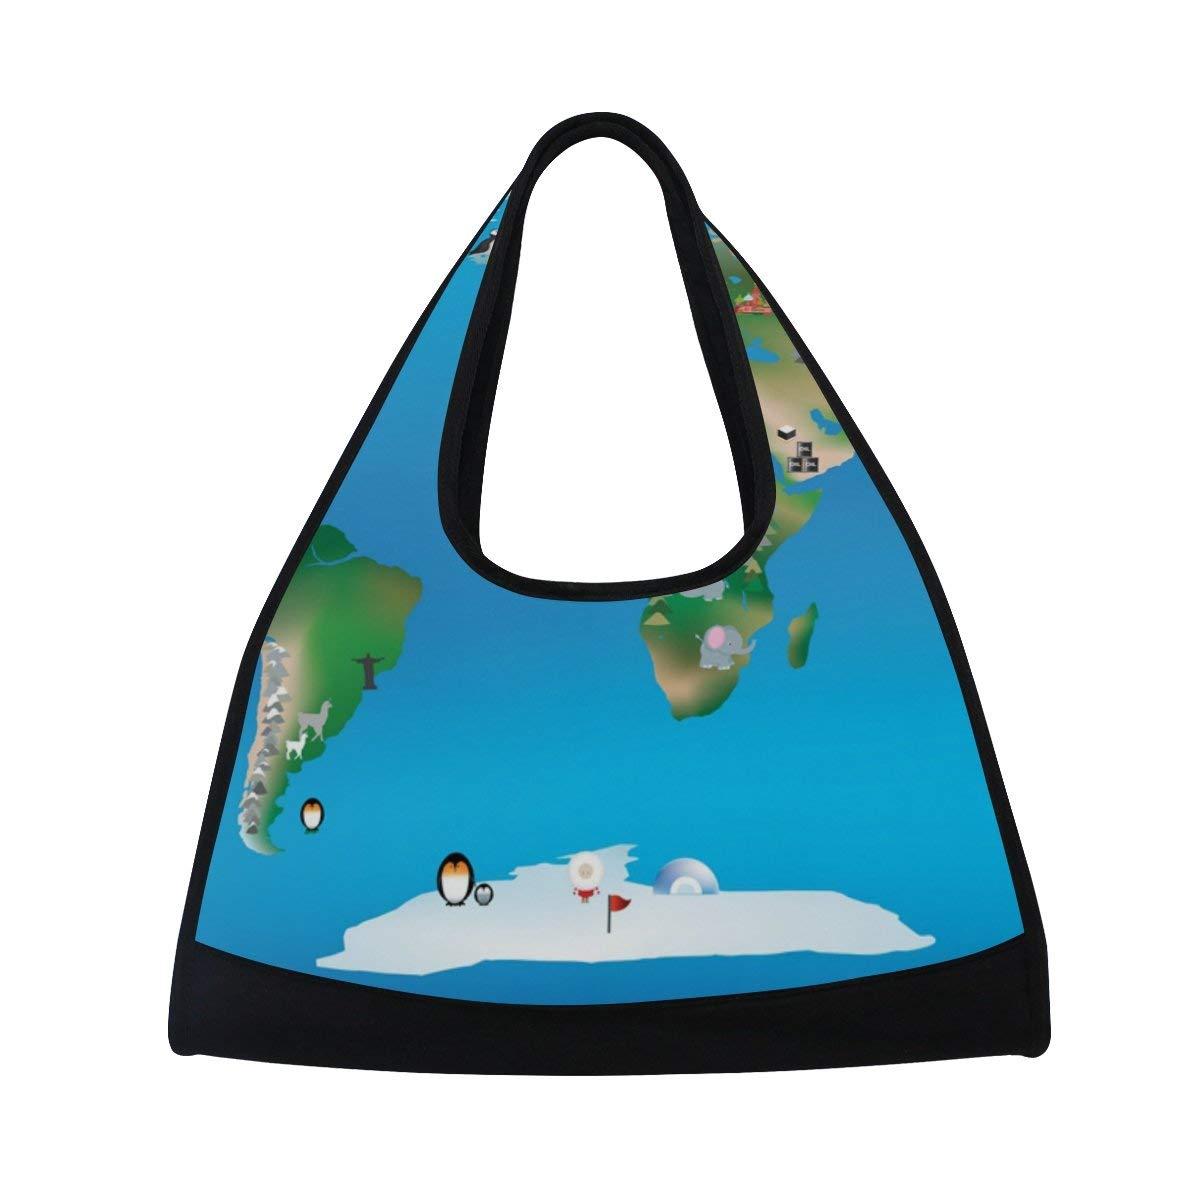 Evolutions Floral Animal Owl Travel Duffel Bag Sports Gym Bag For Men /& Women